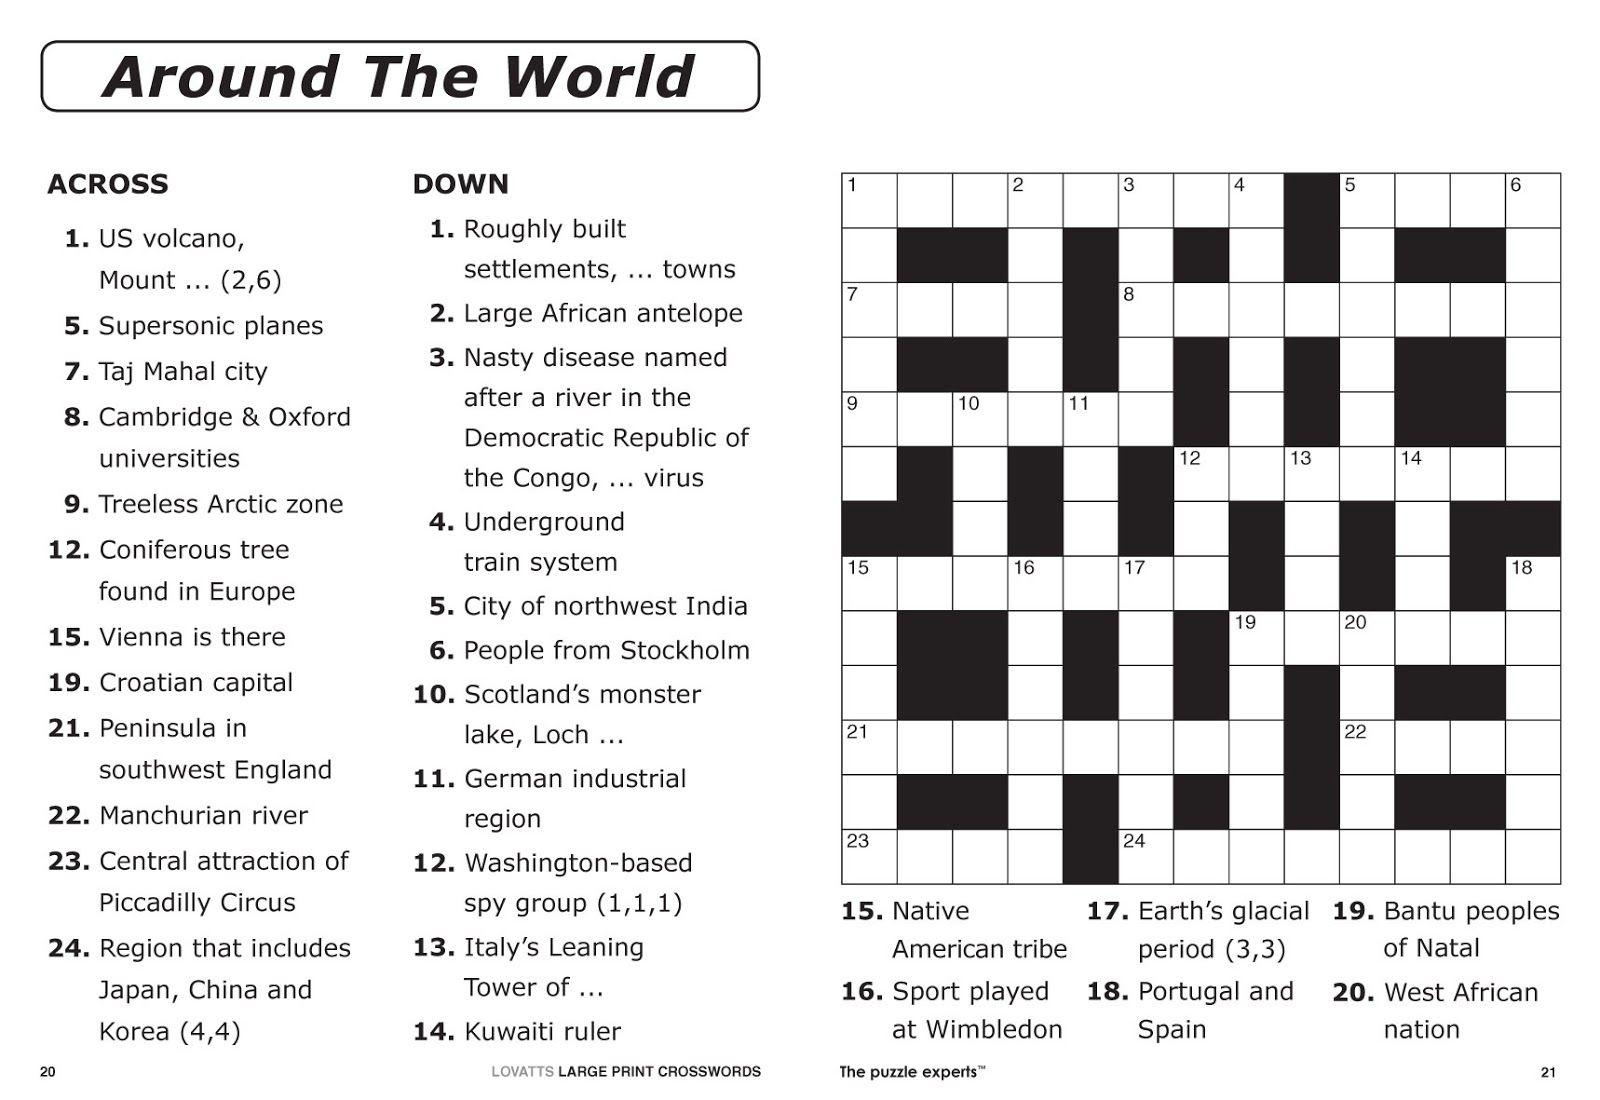 Free Printable Large Print Crossword Puzzles   M3U8 - Printable Crosswords For 6 Year Olds